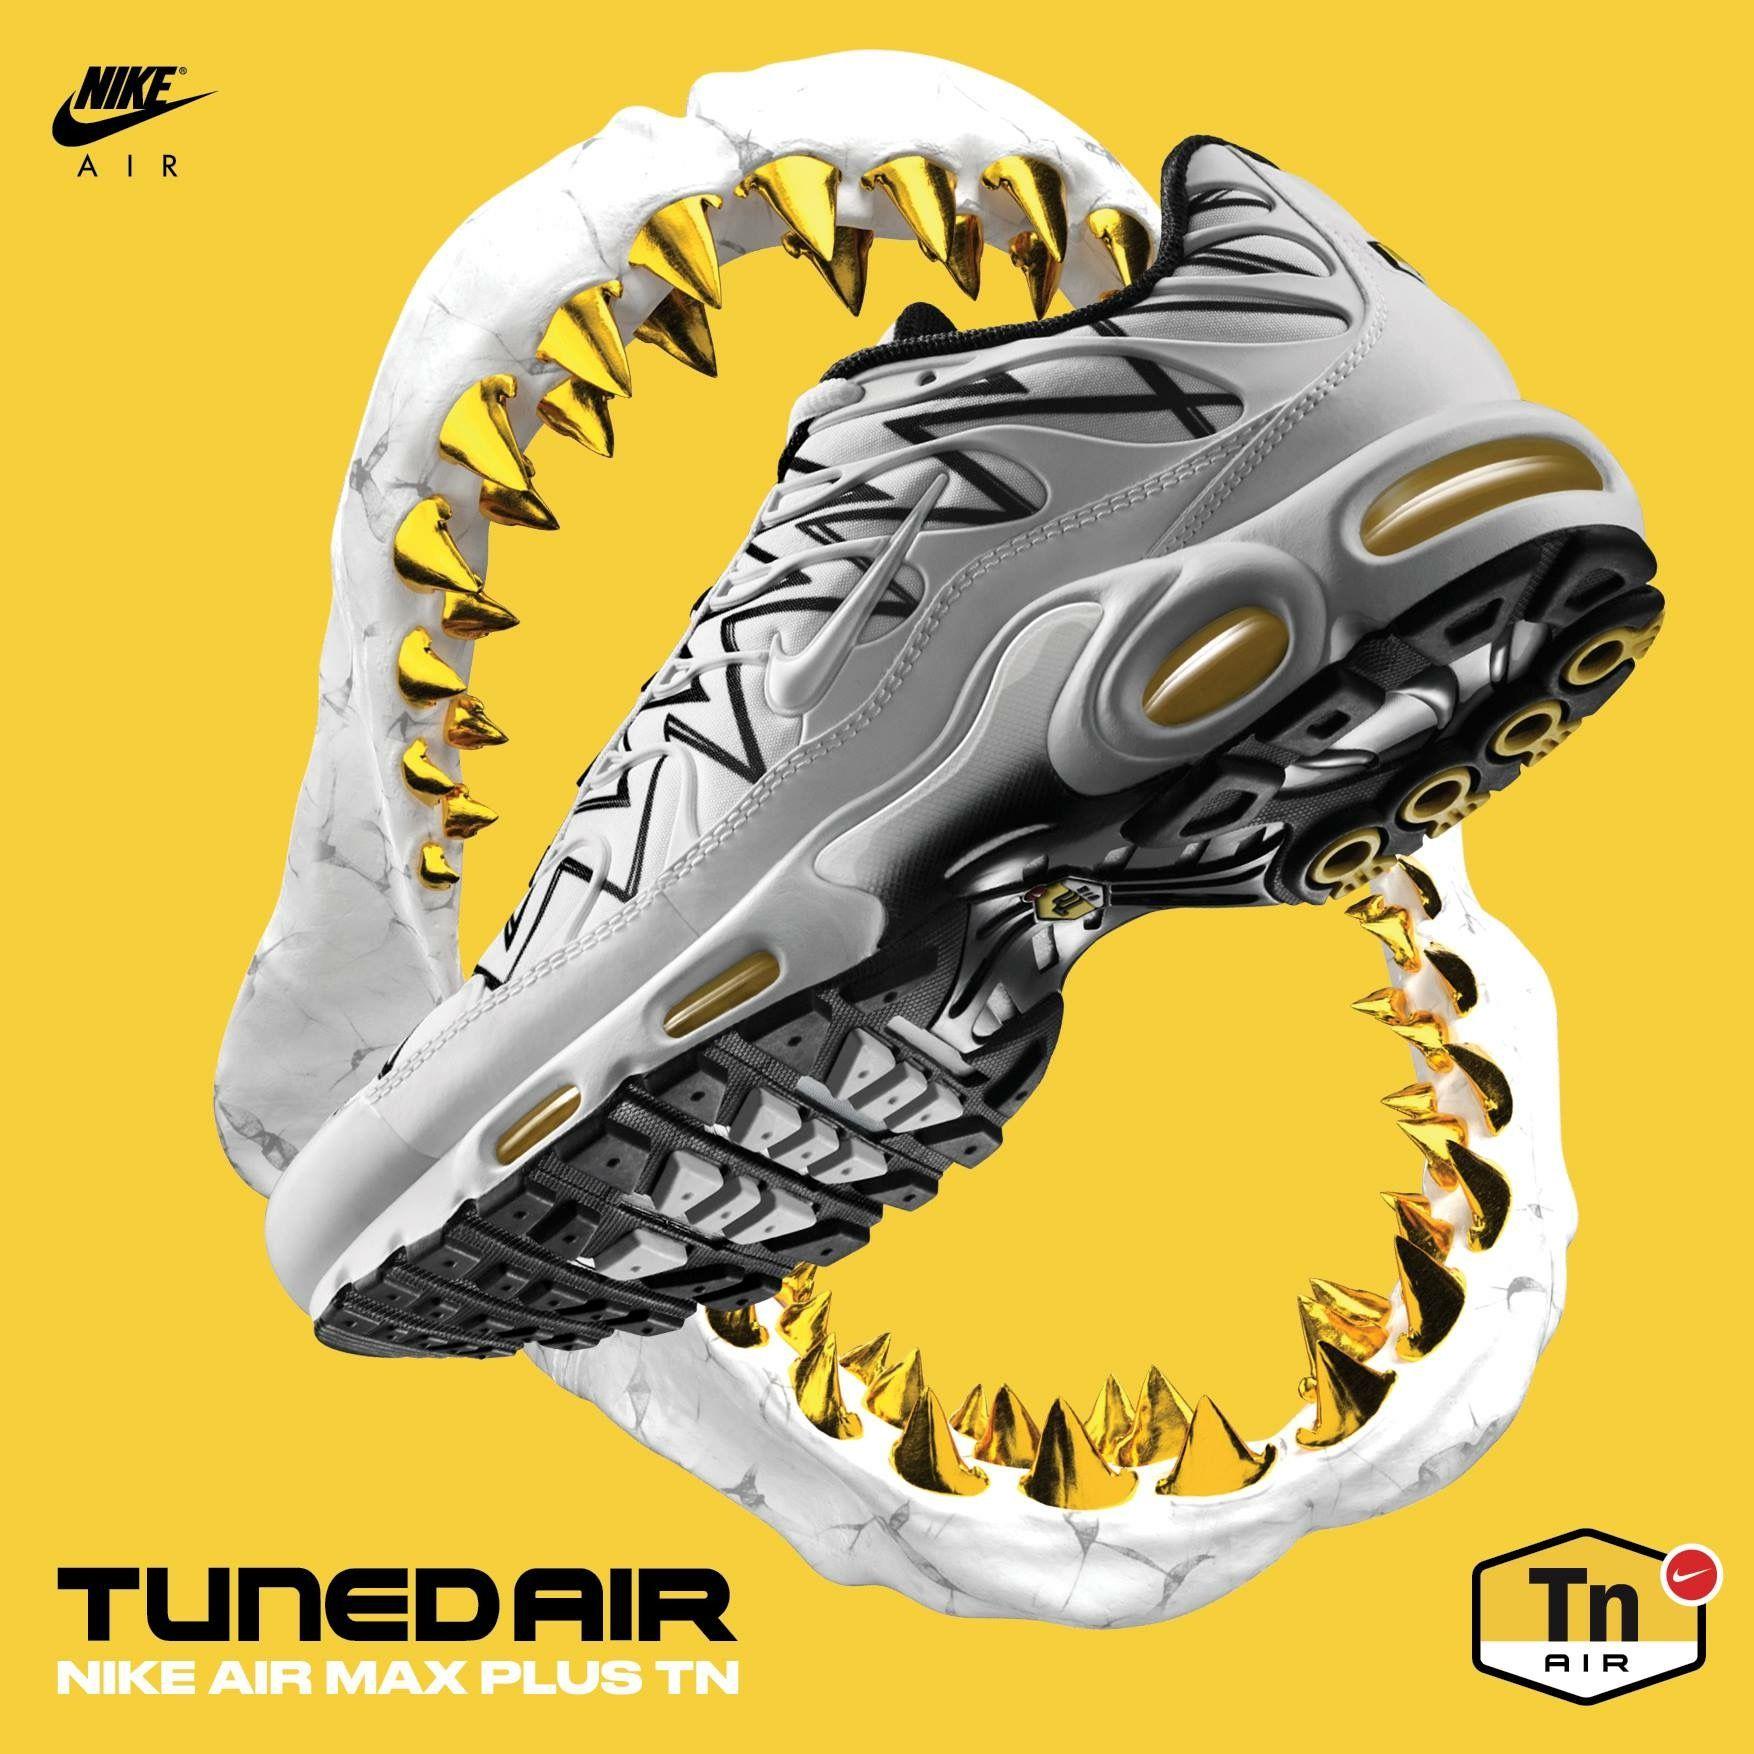 Nike Air Max Plus | Creative studio, Nike air max plus, Air max plus